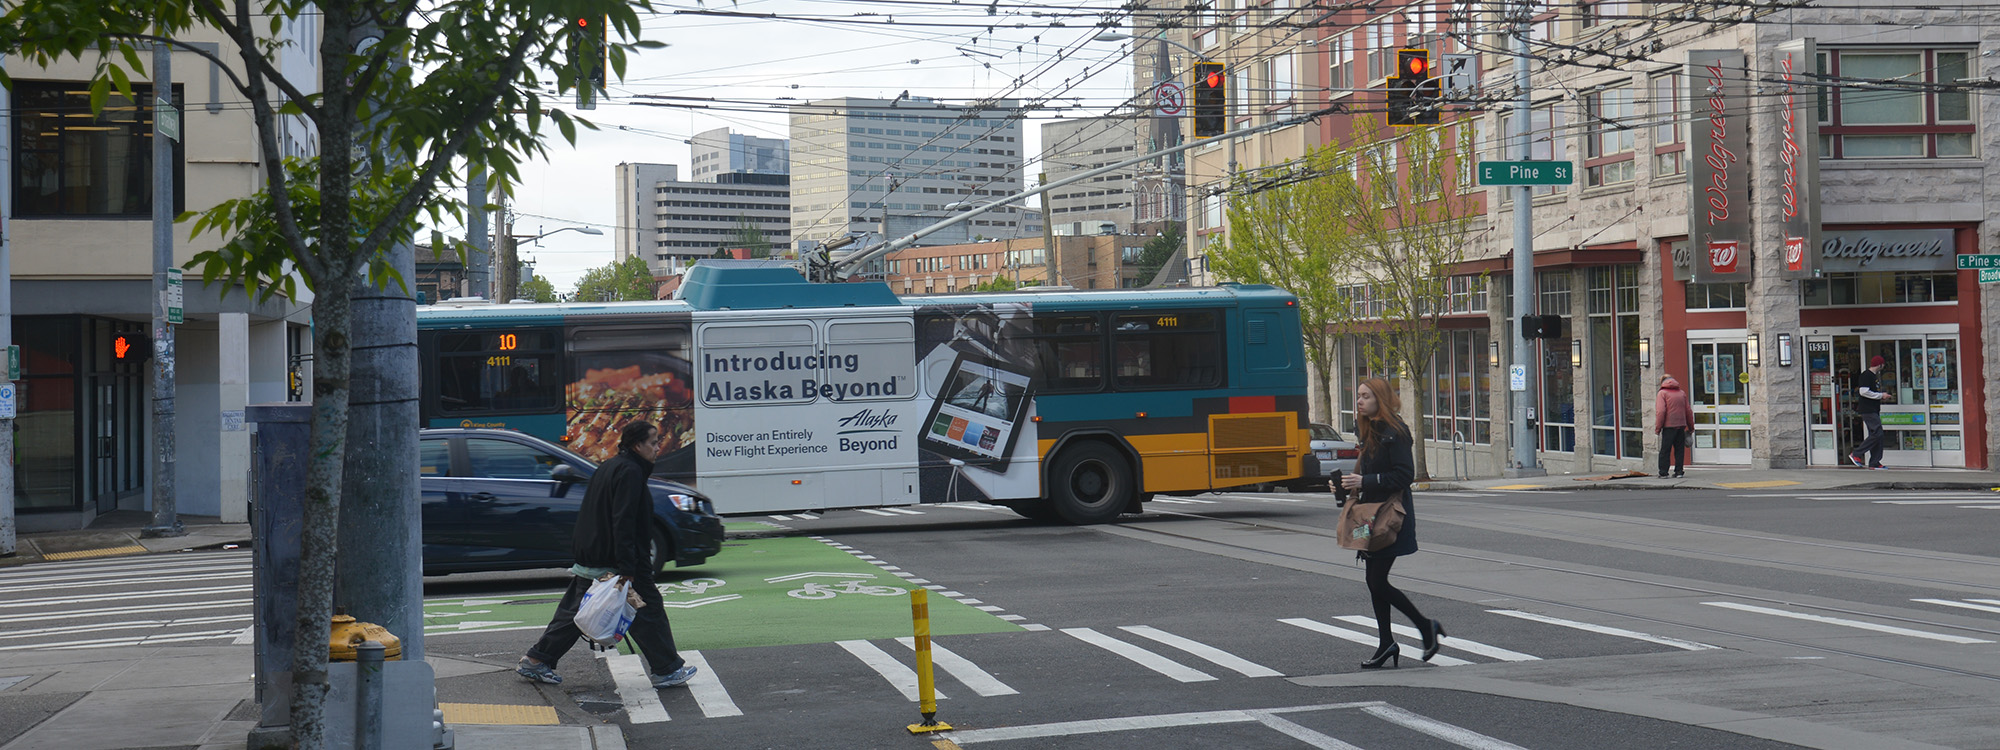 pedestrians in crosswalk, bus passing behind them